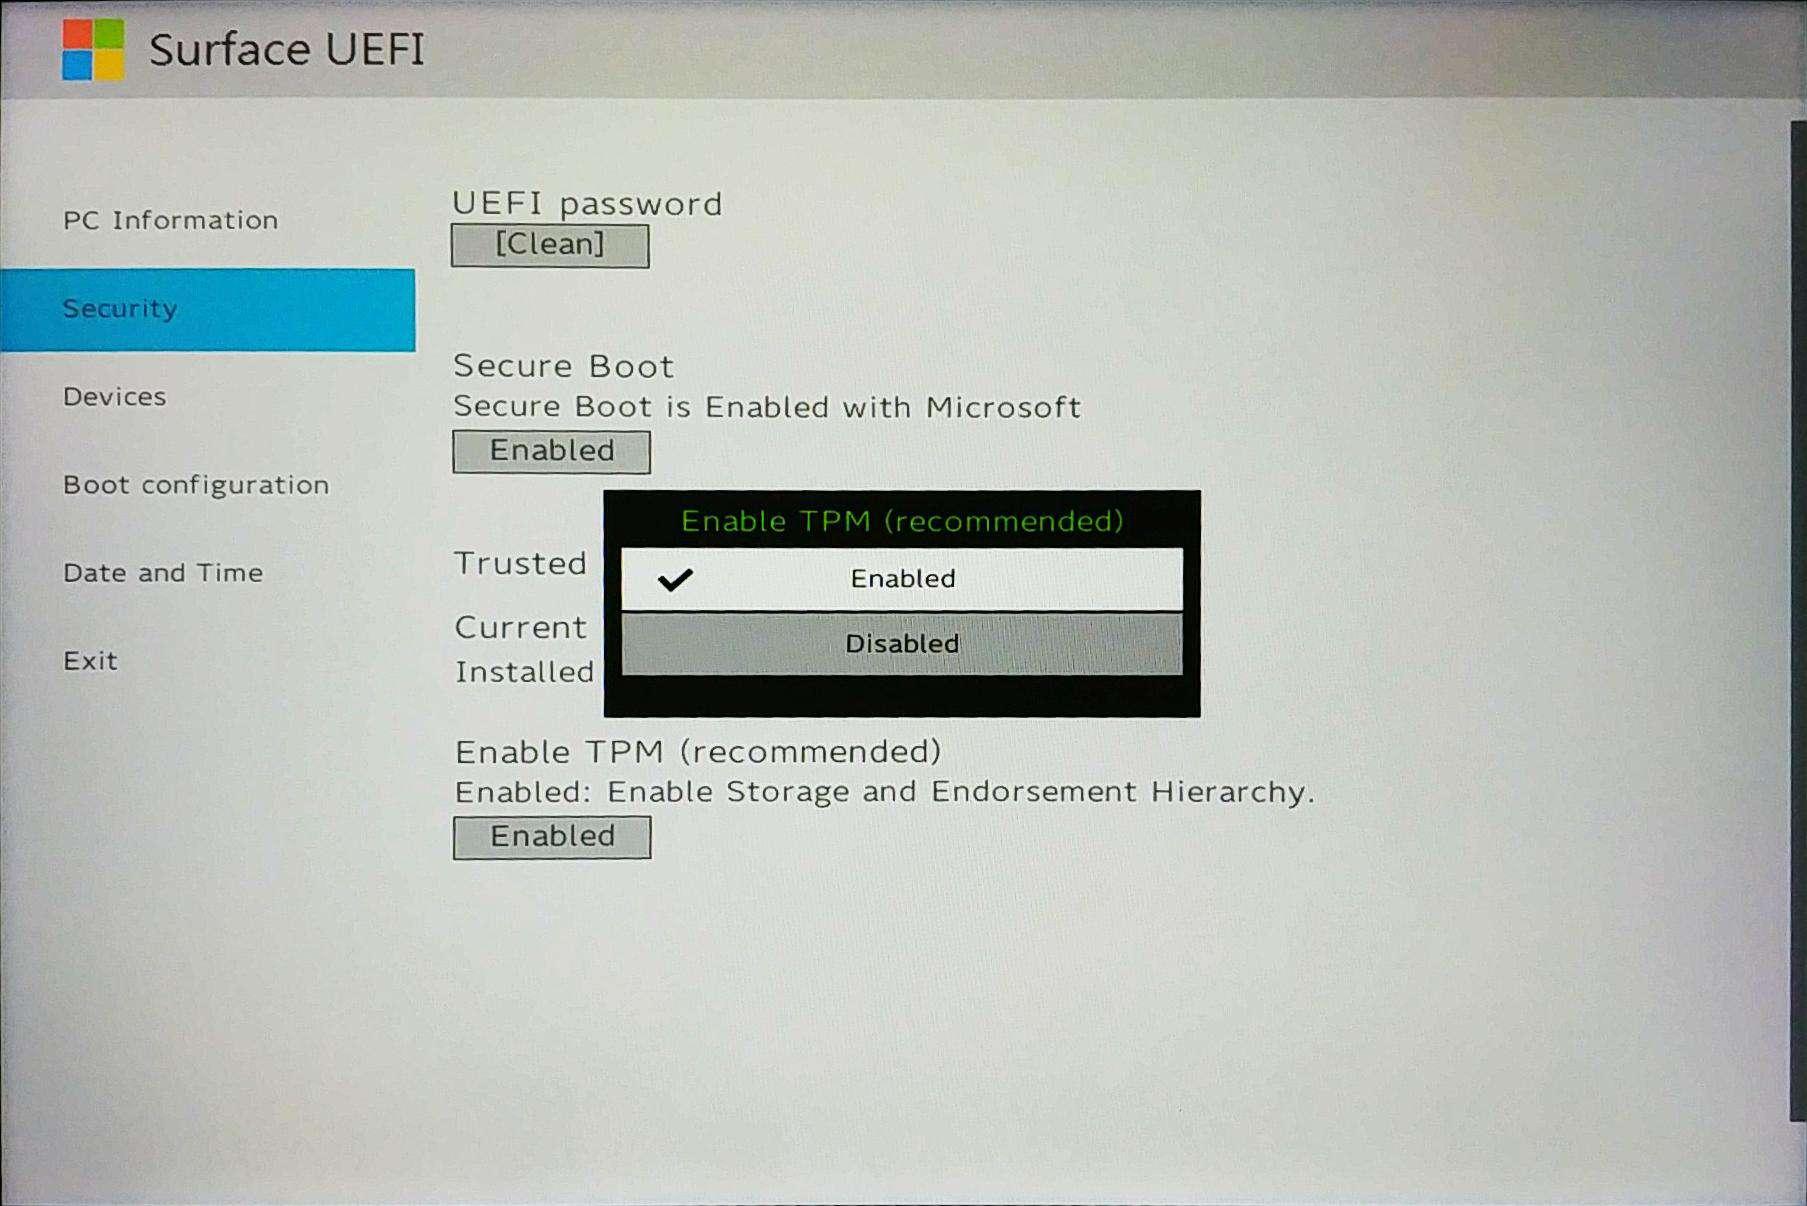 Surface Go UEFI - Control TPM